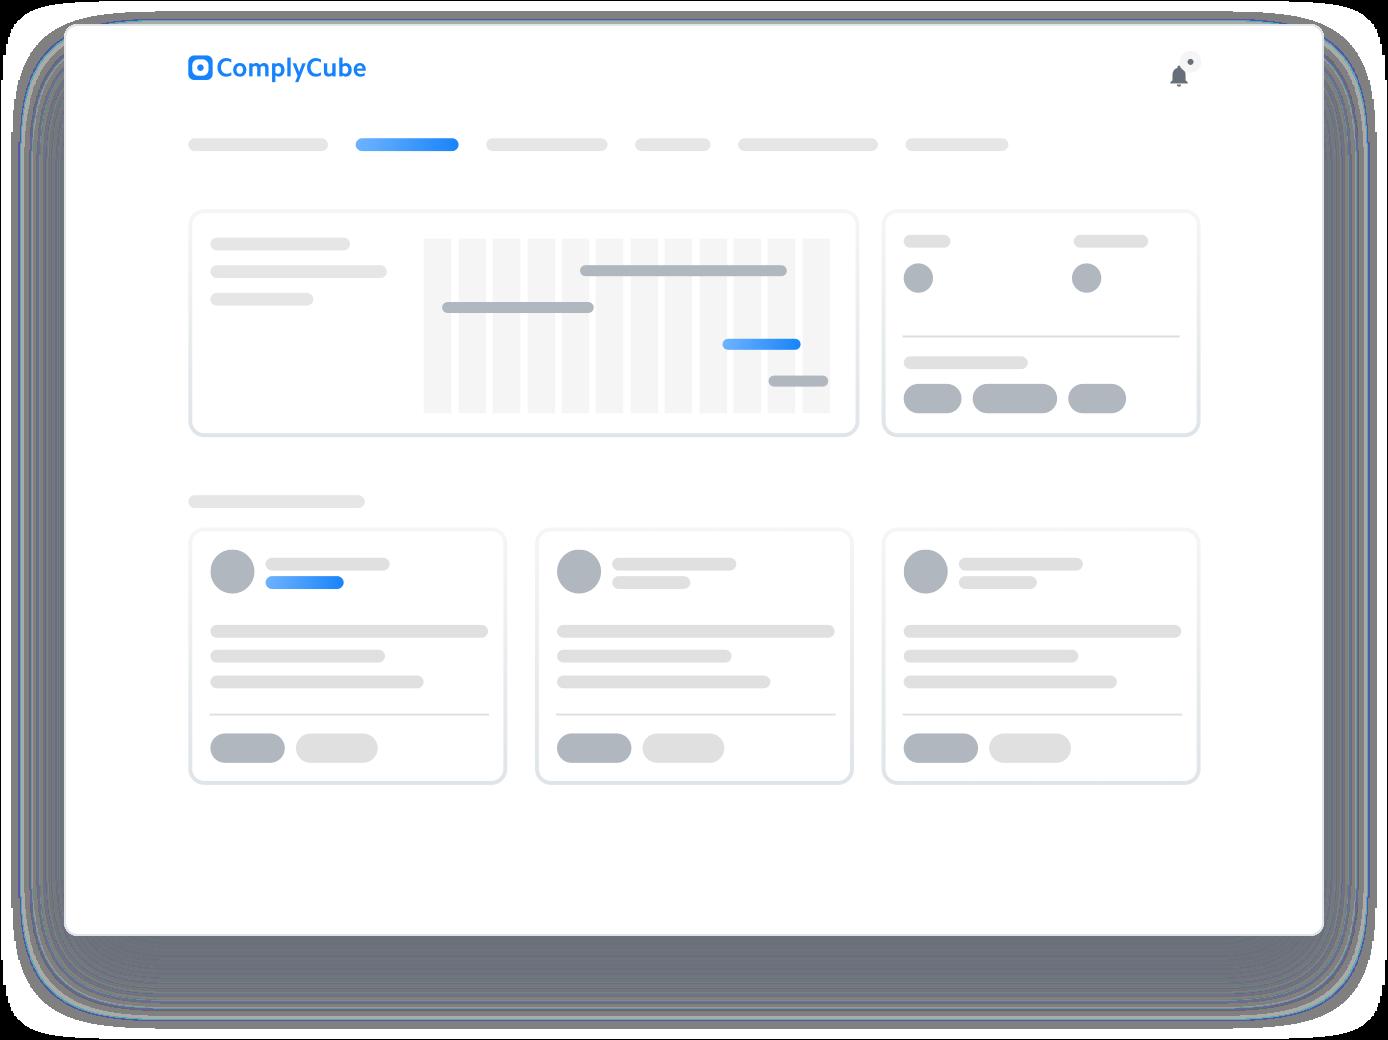 Web portal shown on iPad